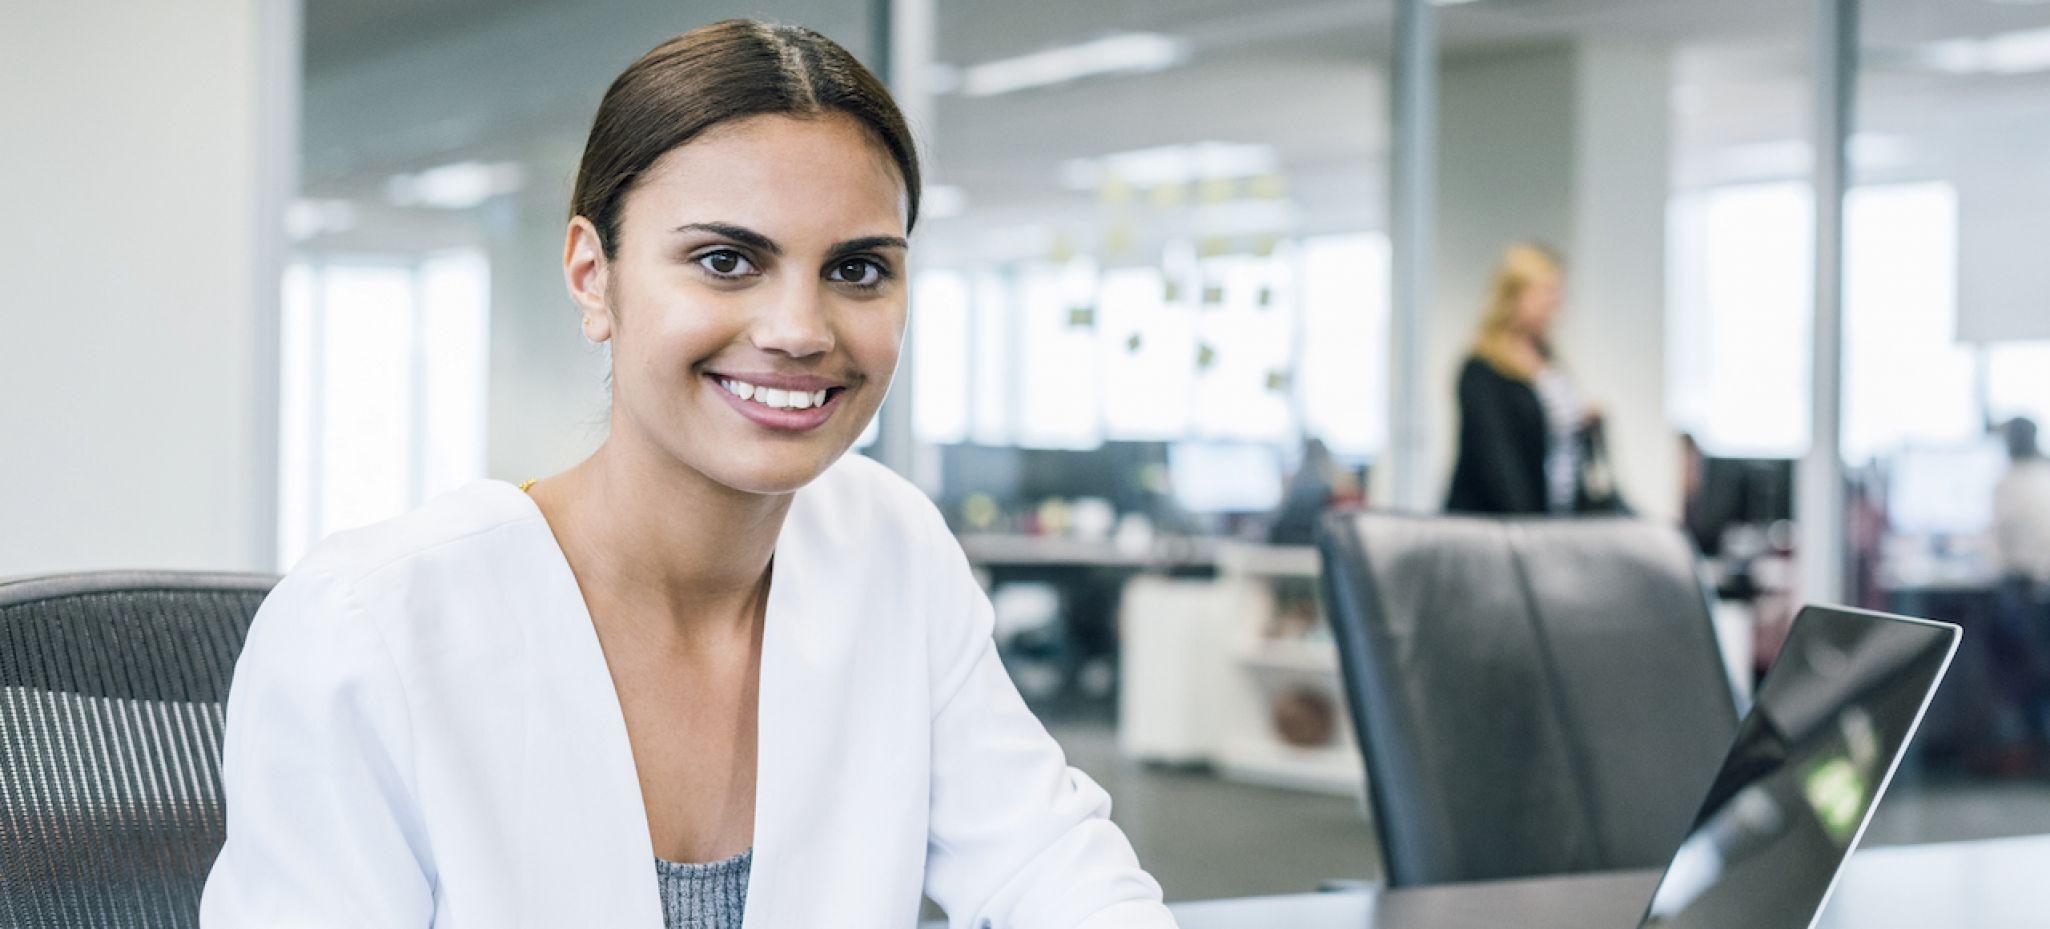 Improve your skills in Procurement